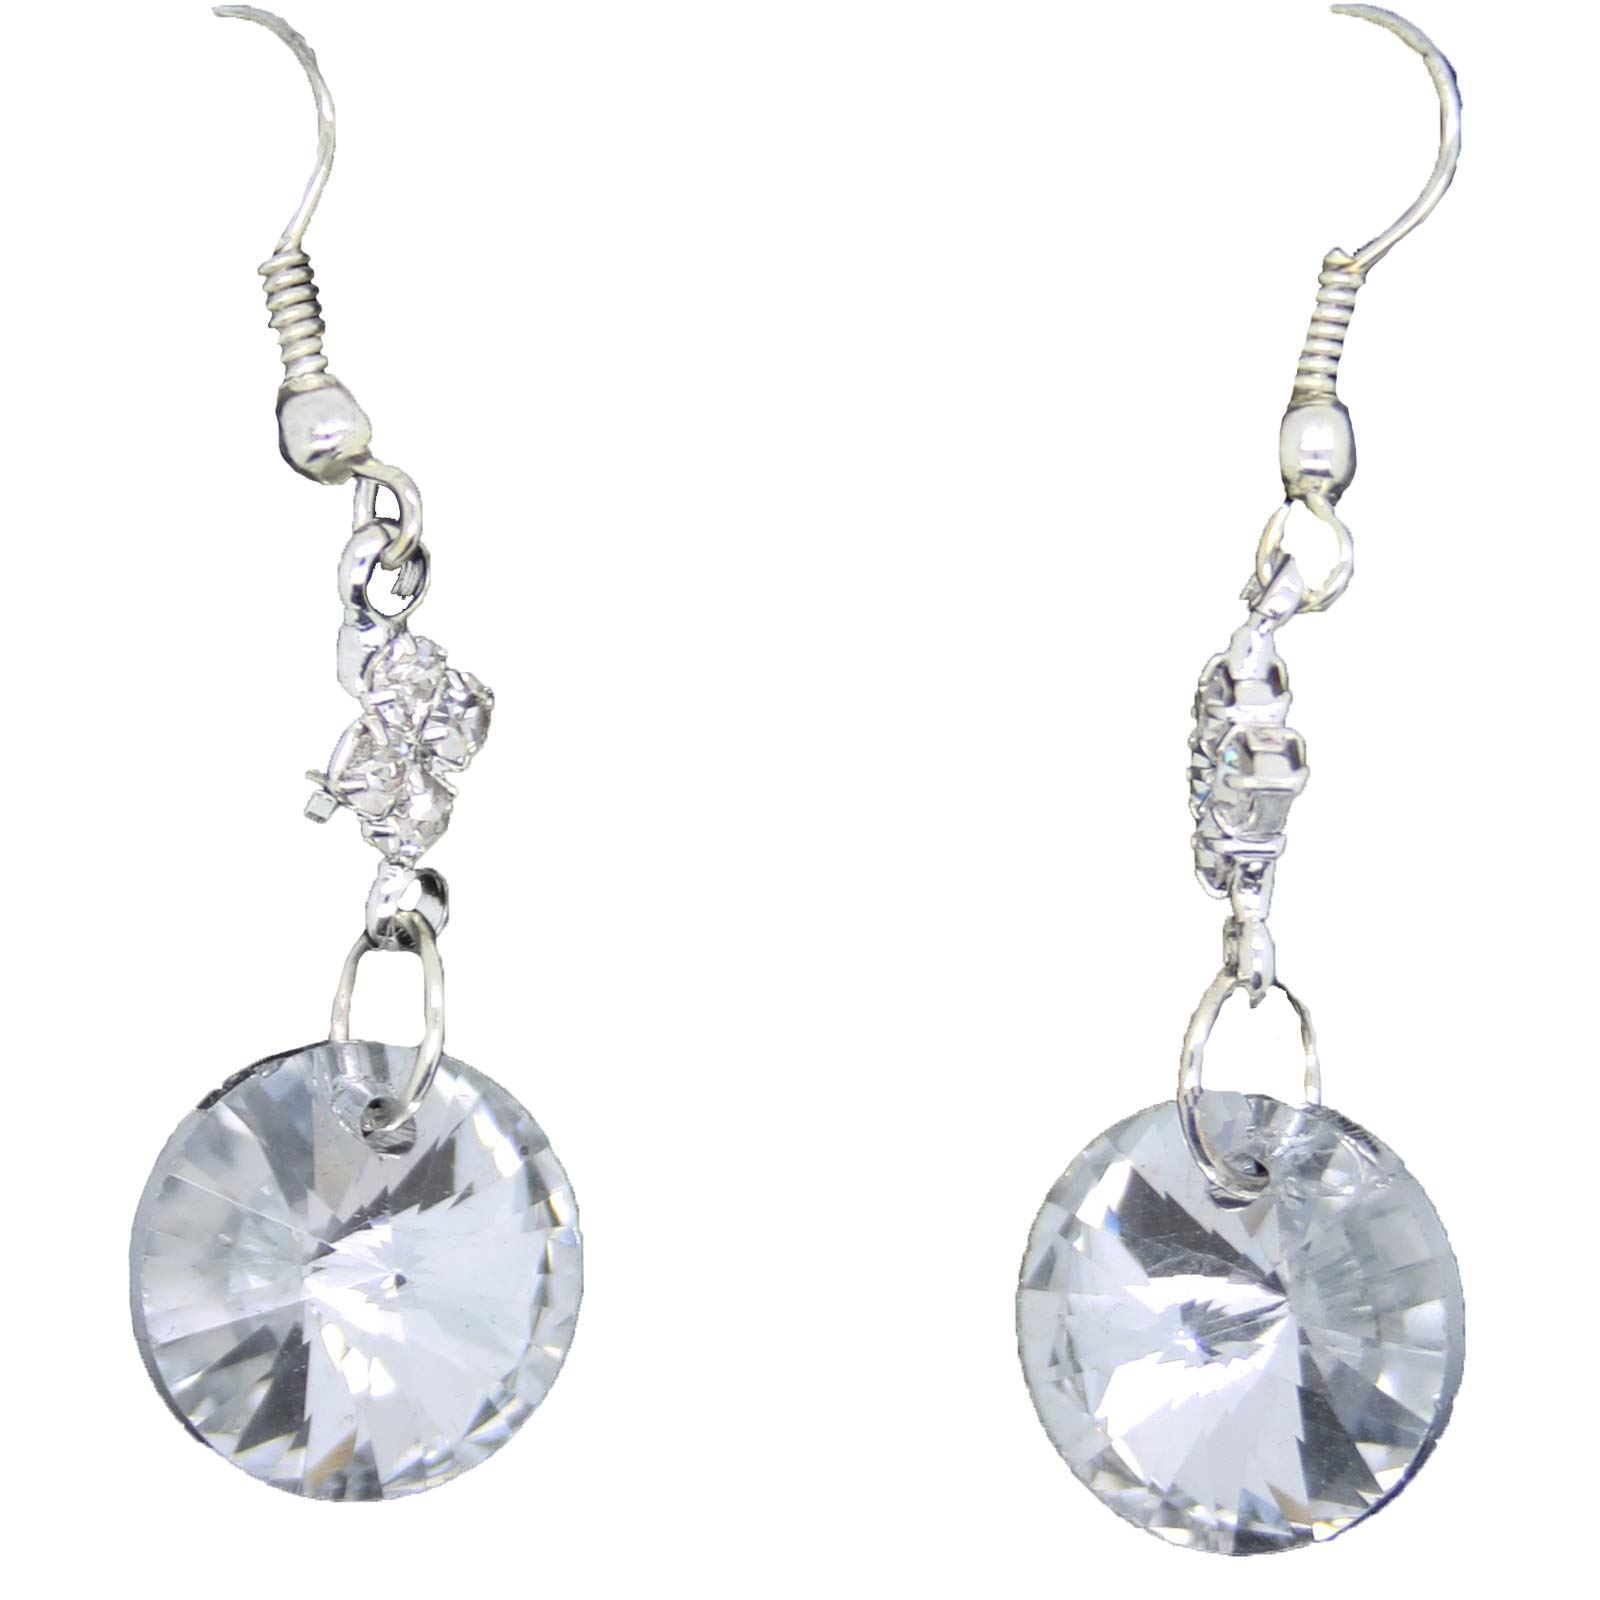 True-Face-Ladies-Women-039-s-Elegant-Earrings-Necklace-Set-Metal-Alloy-Jewellery thumbnail 35